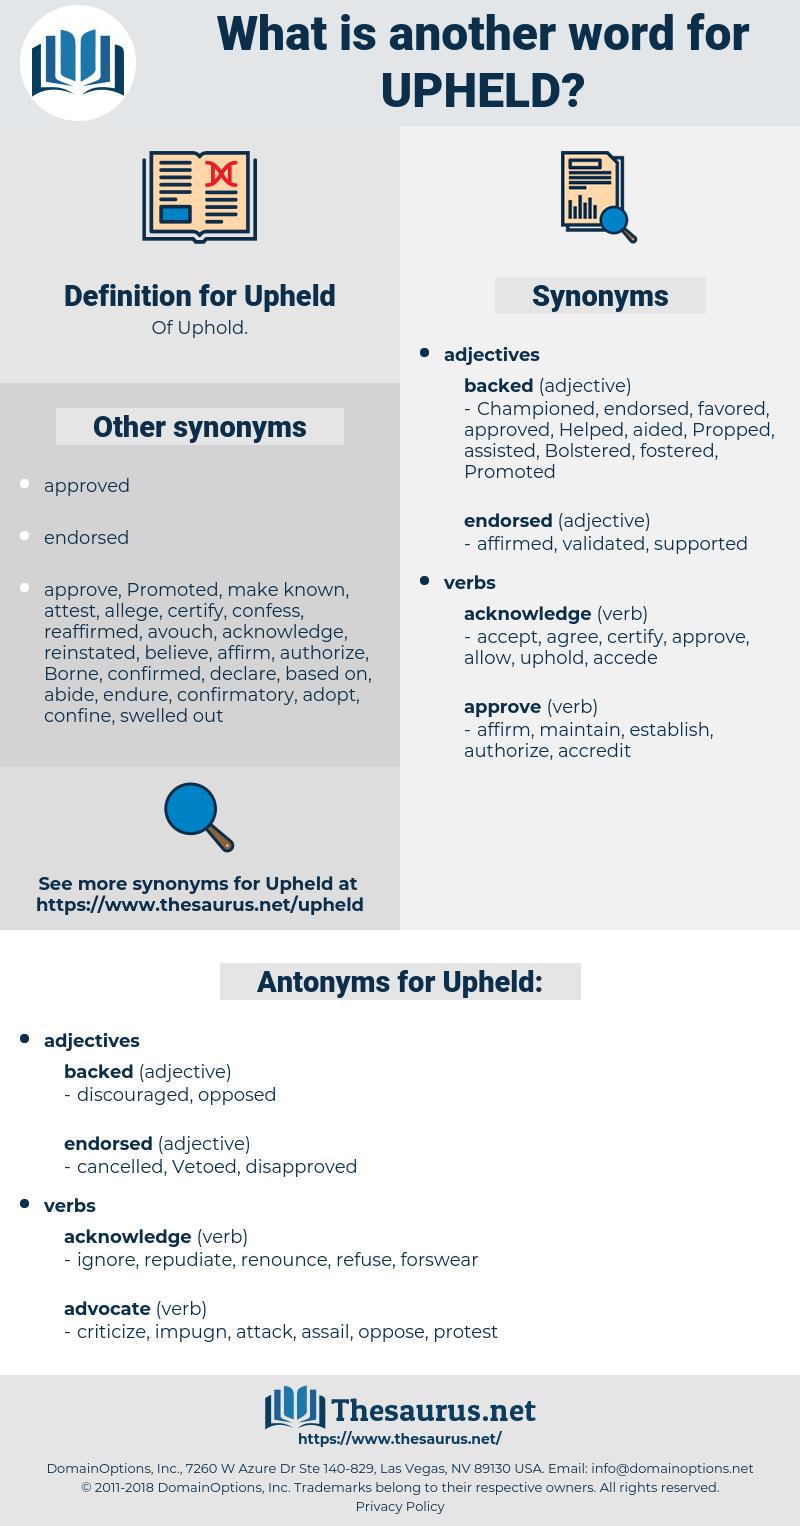 Upheld, synonym Upheld, another word for Upheld, words like Upheld, thesaurus Upheld